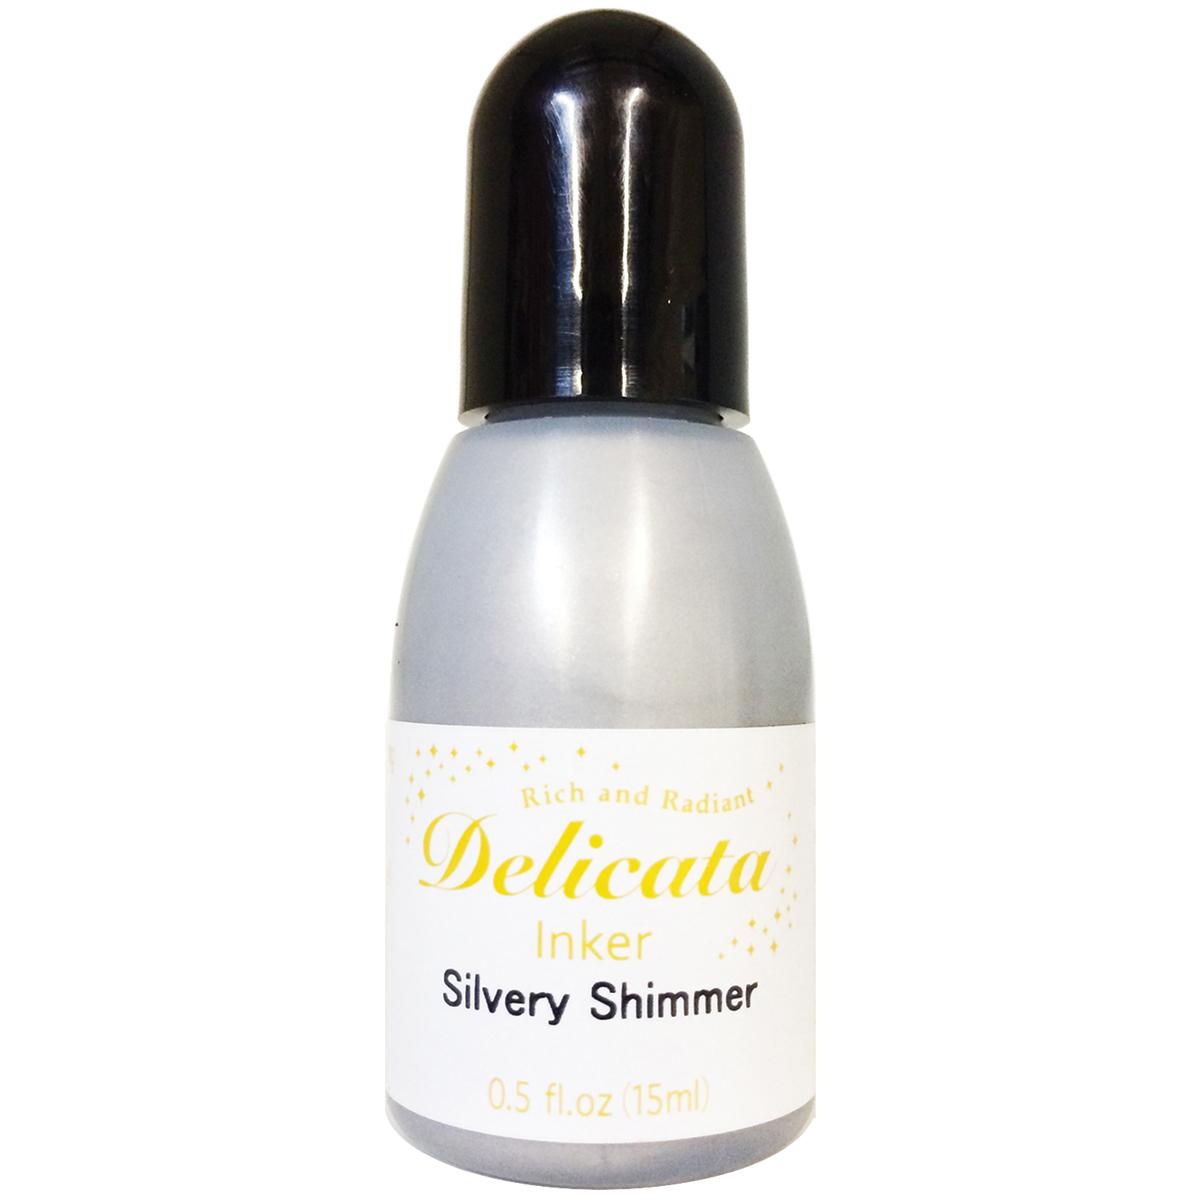 Delicata Silver Shimmer Refill